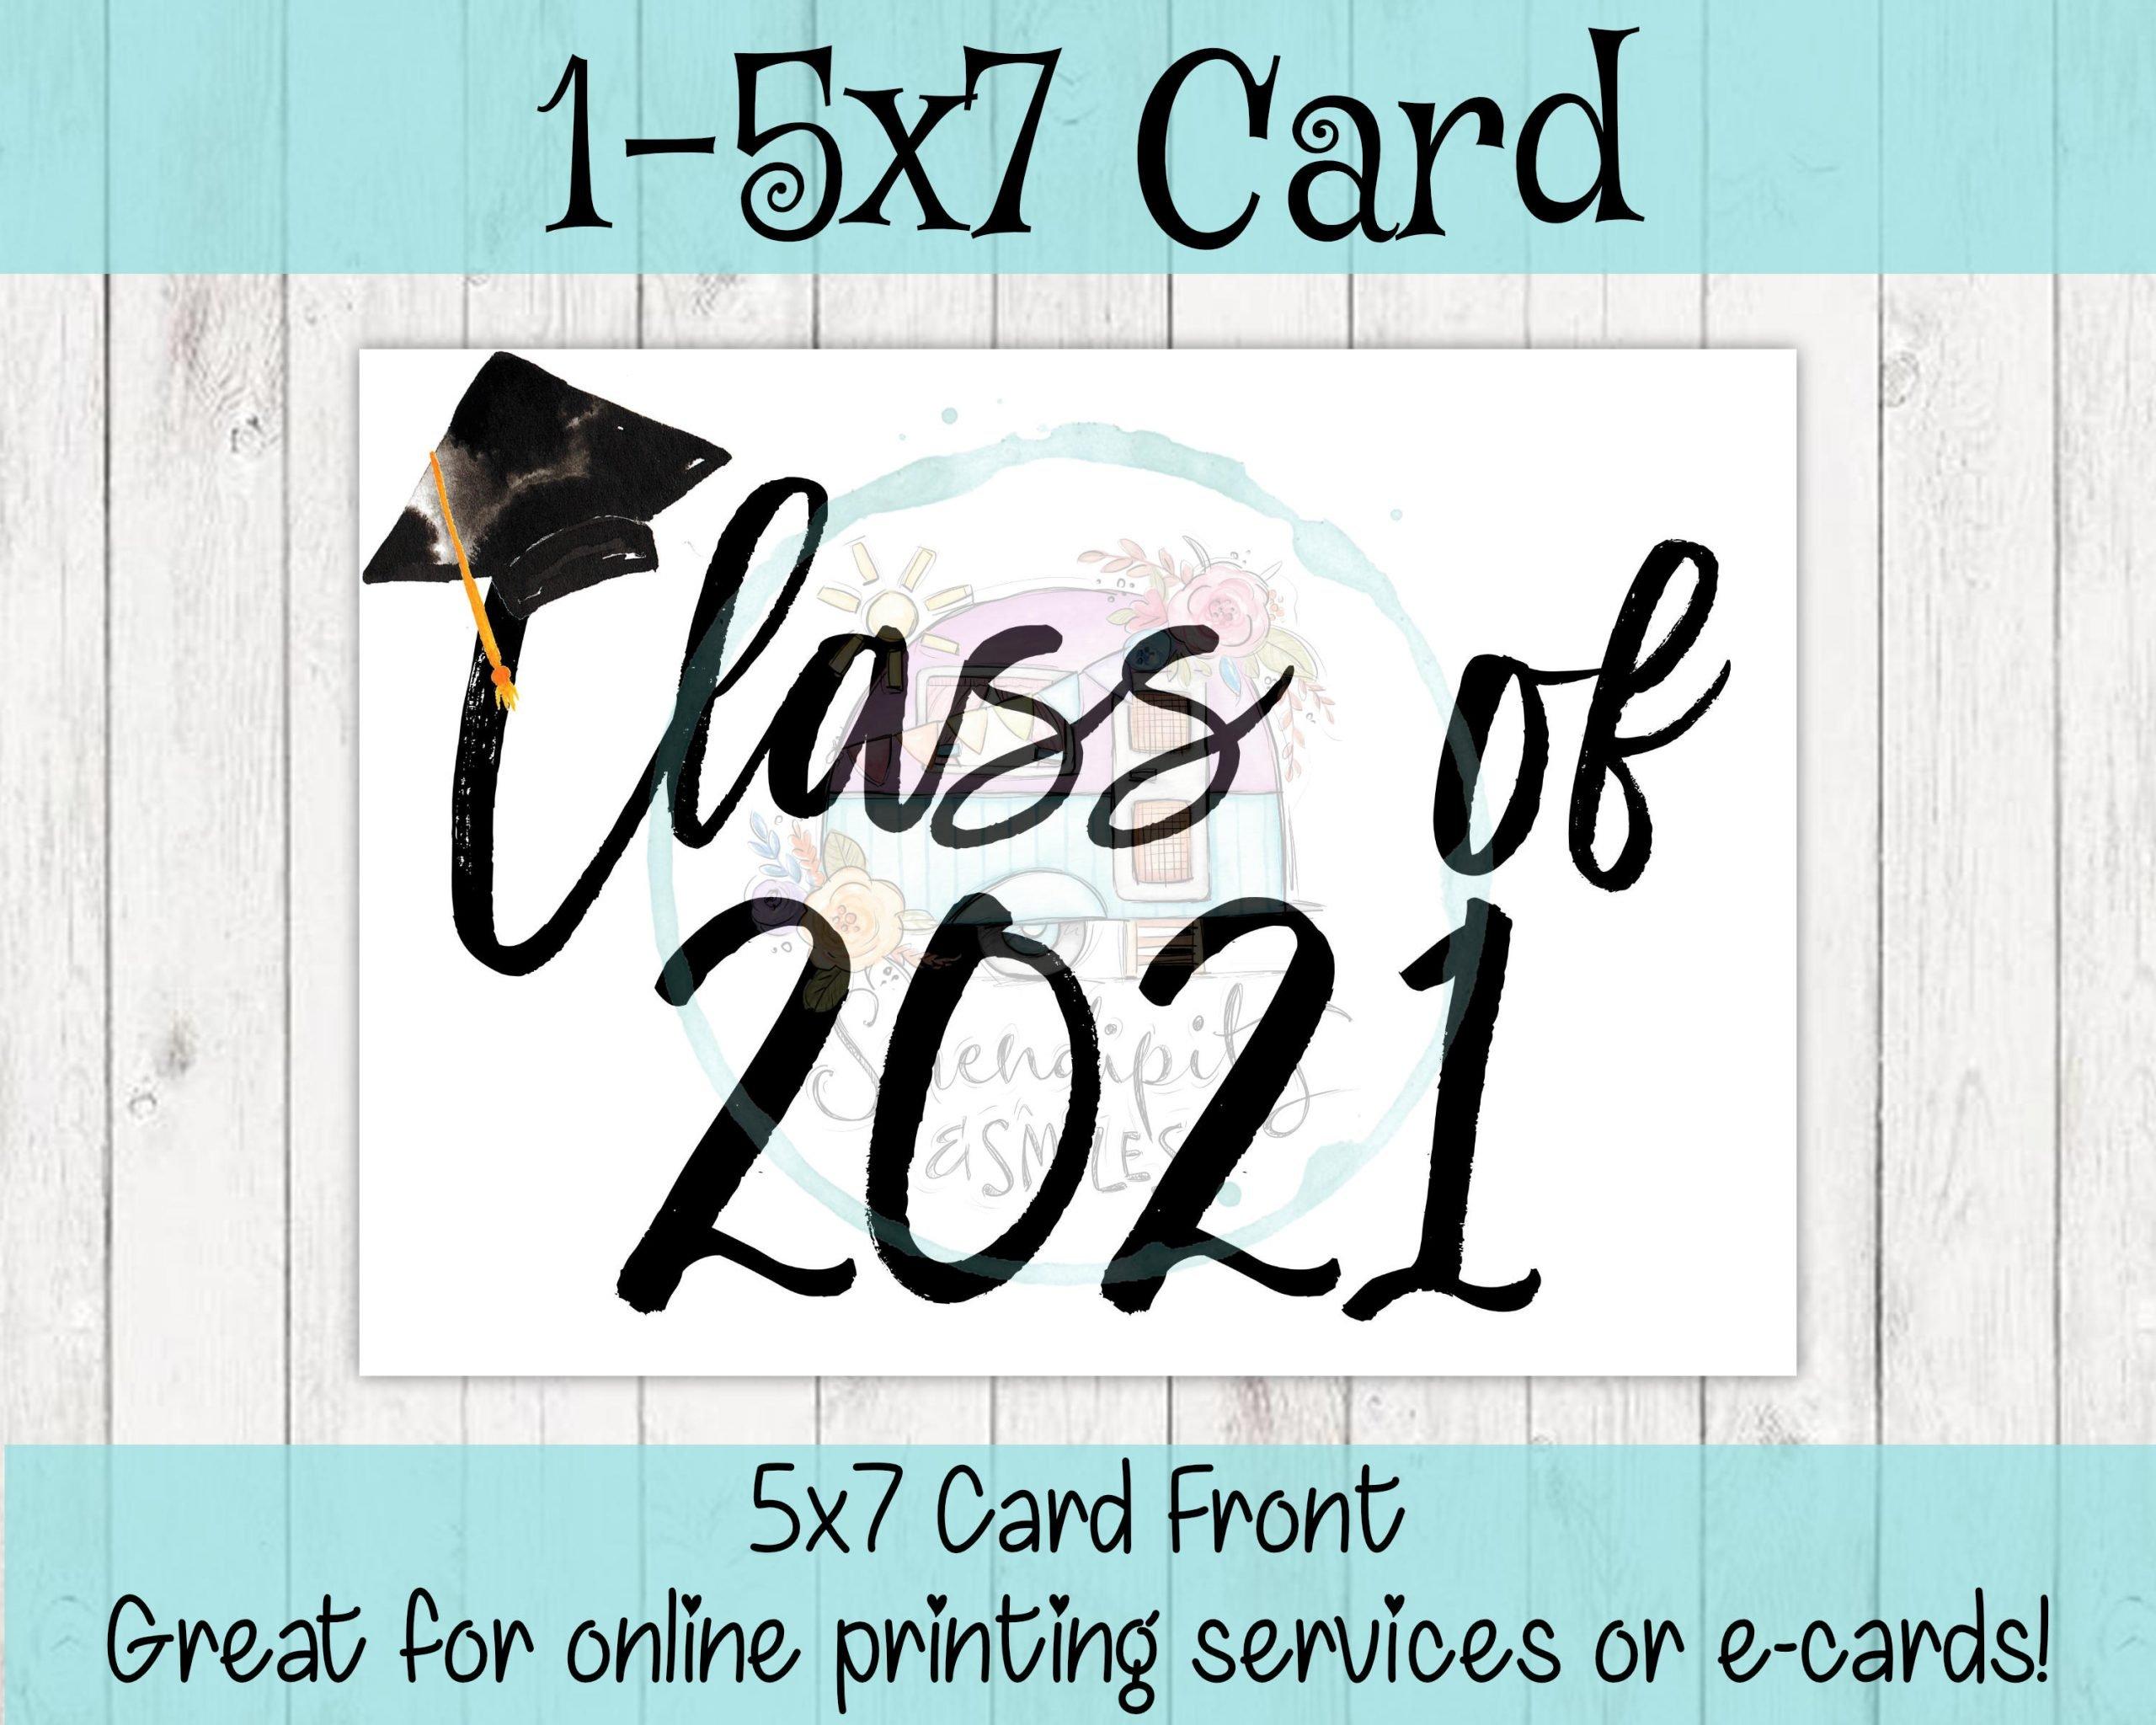 Class of 2021 Card Mockup 4